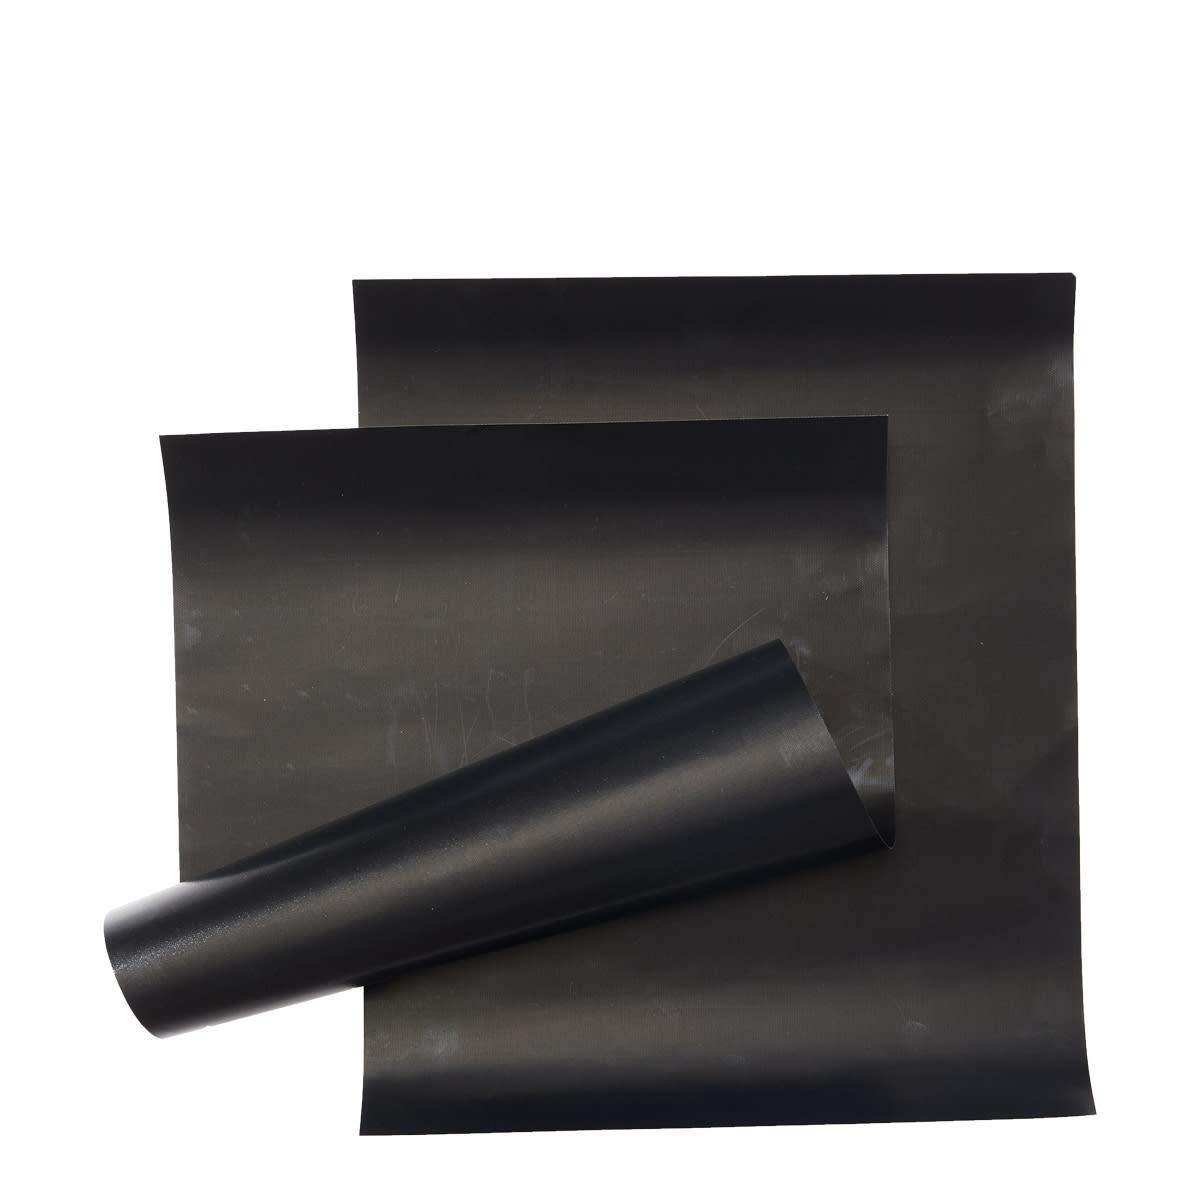 Cuisinart Reusable Non-Stick Grilling Sheets - Set of 2